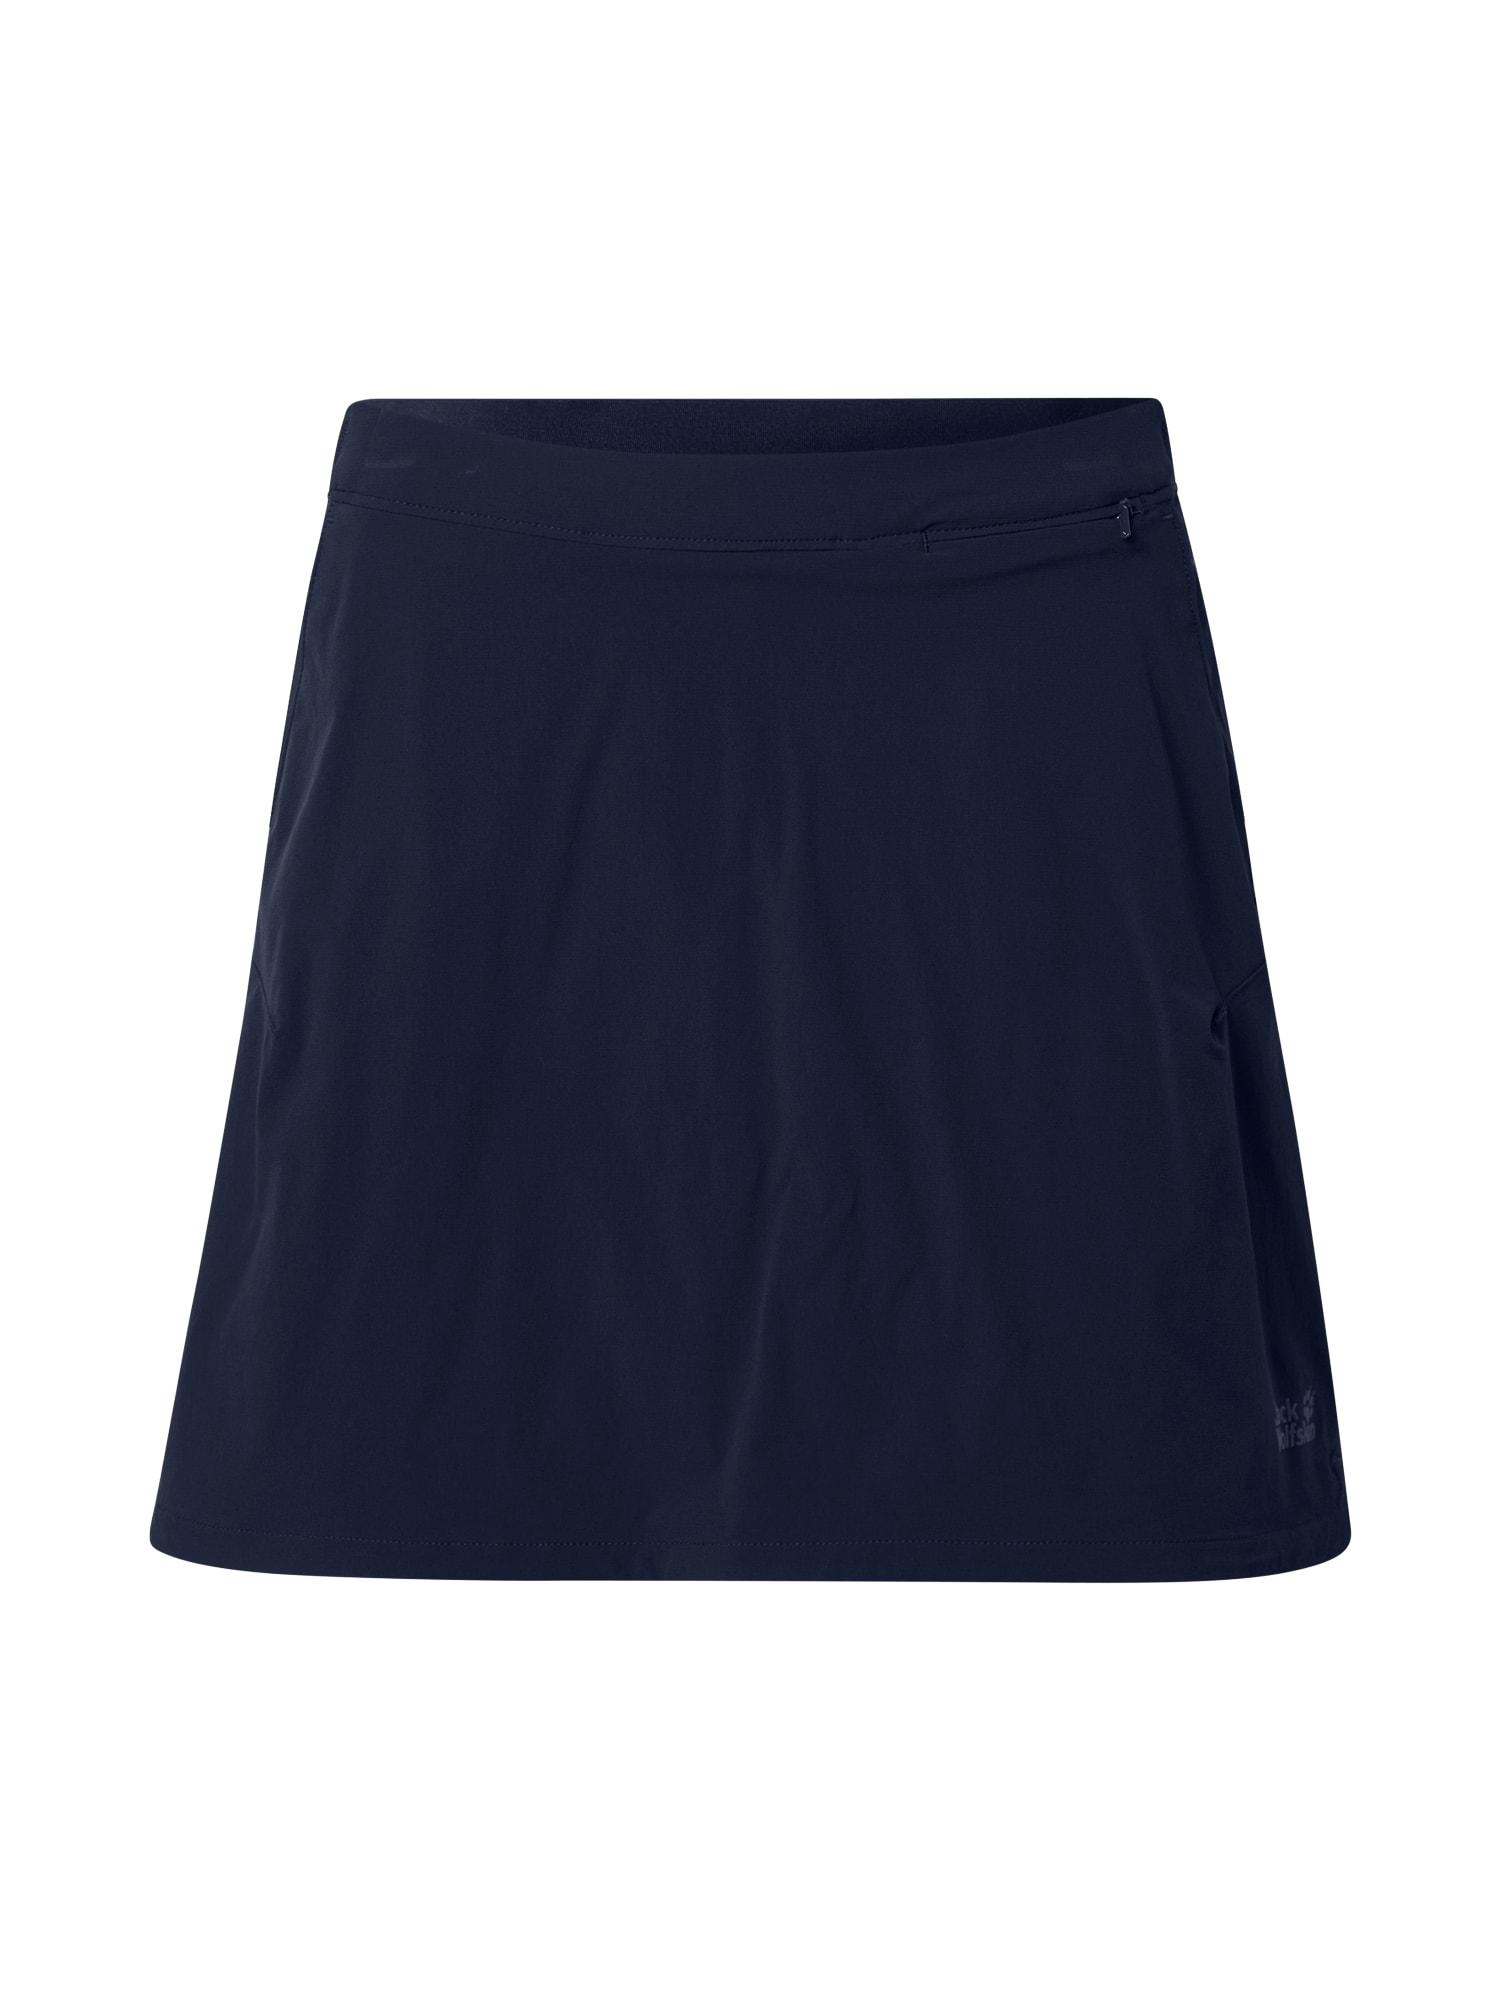 JACK WOLFSKIN Sportinio stiliaus sijonas nakties mėlyna